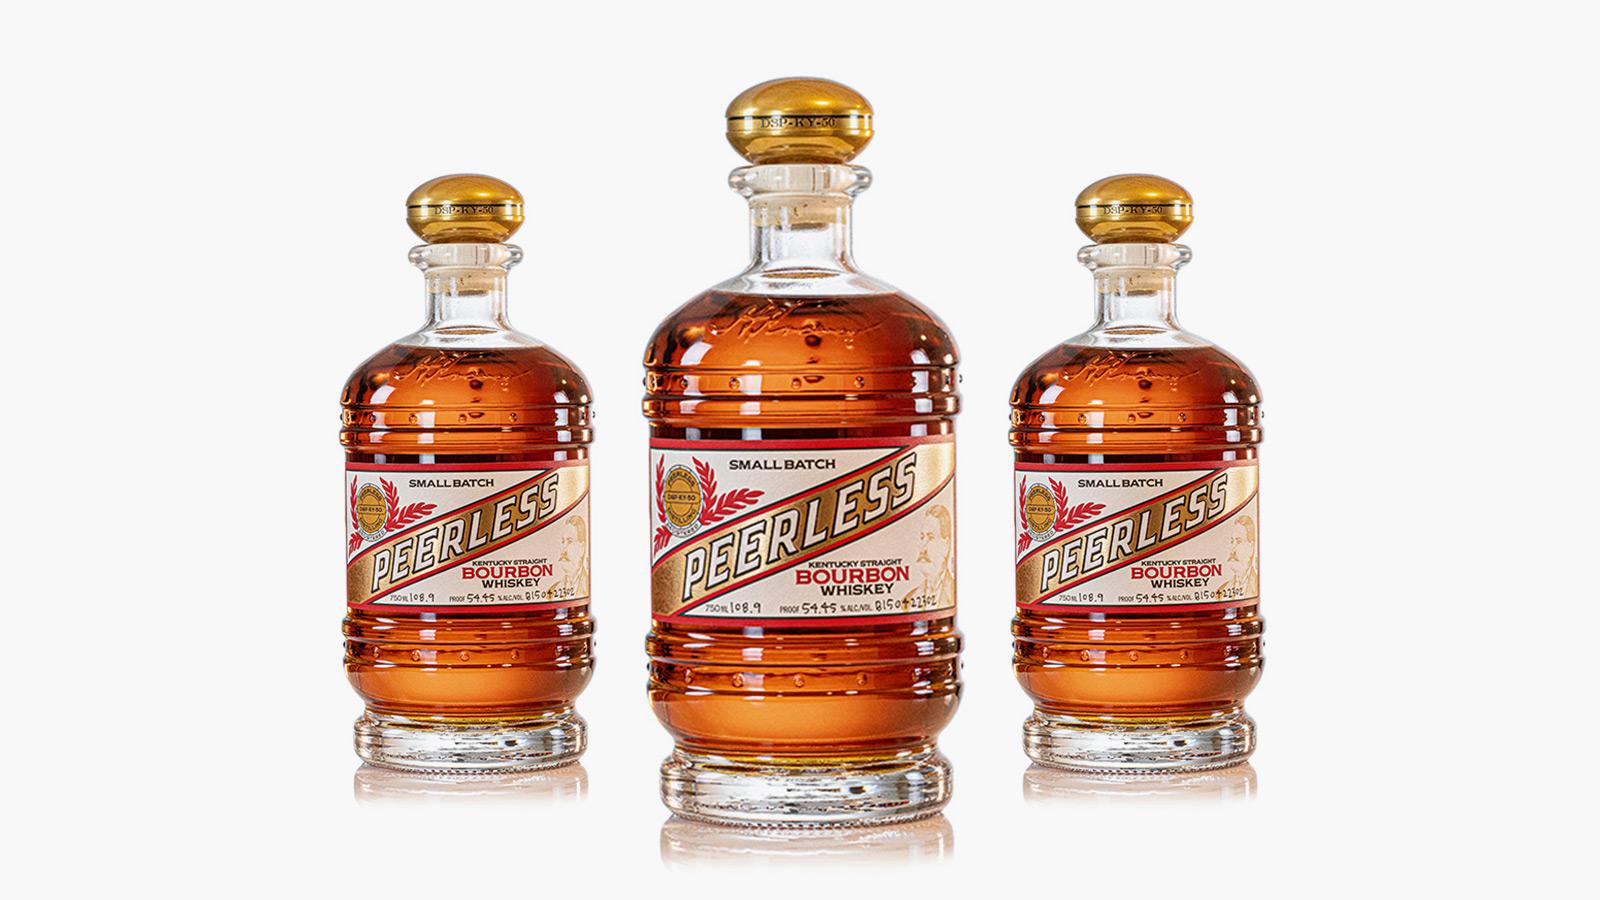 Peerless Distilling Bourbo